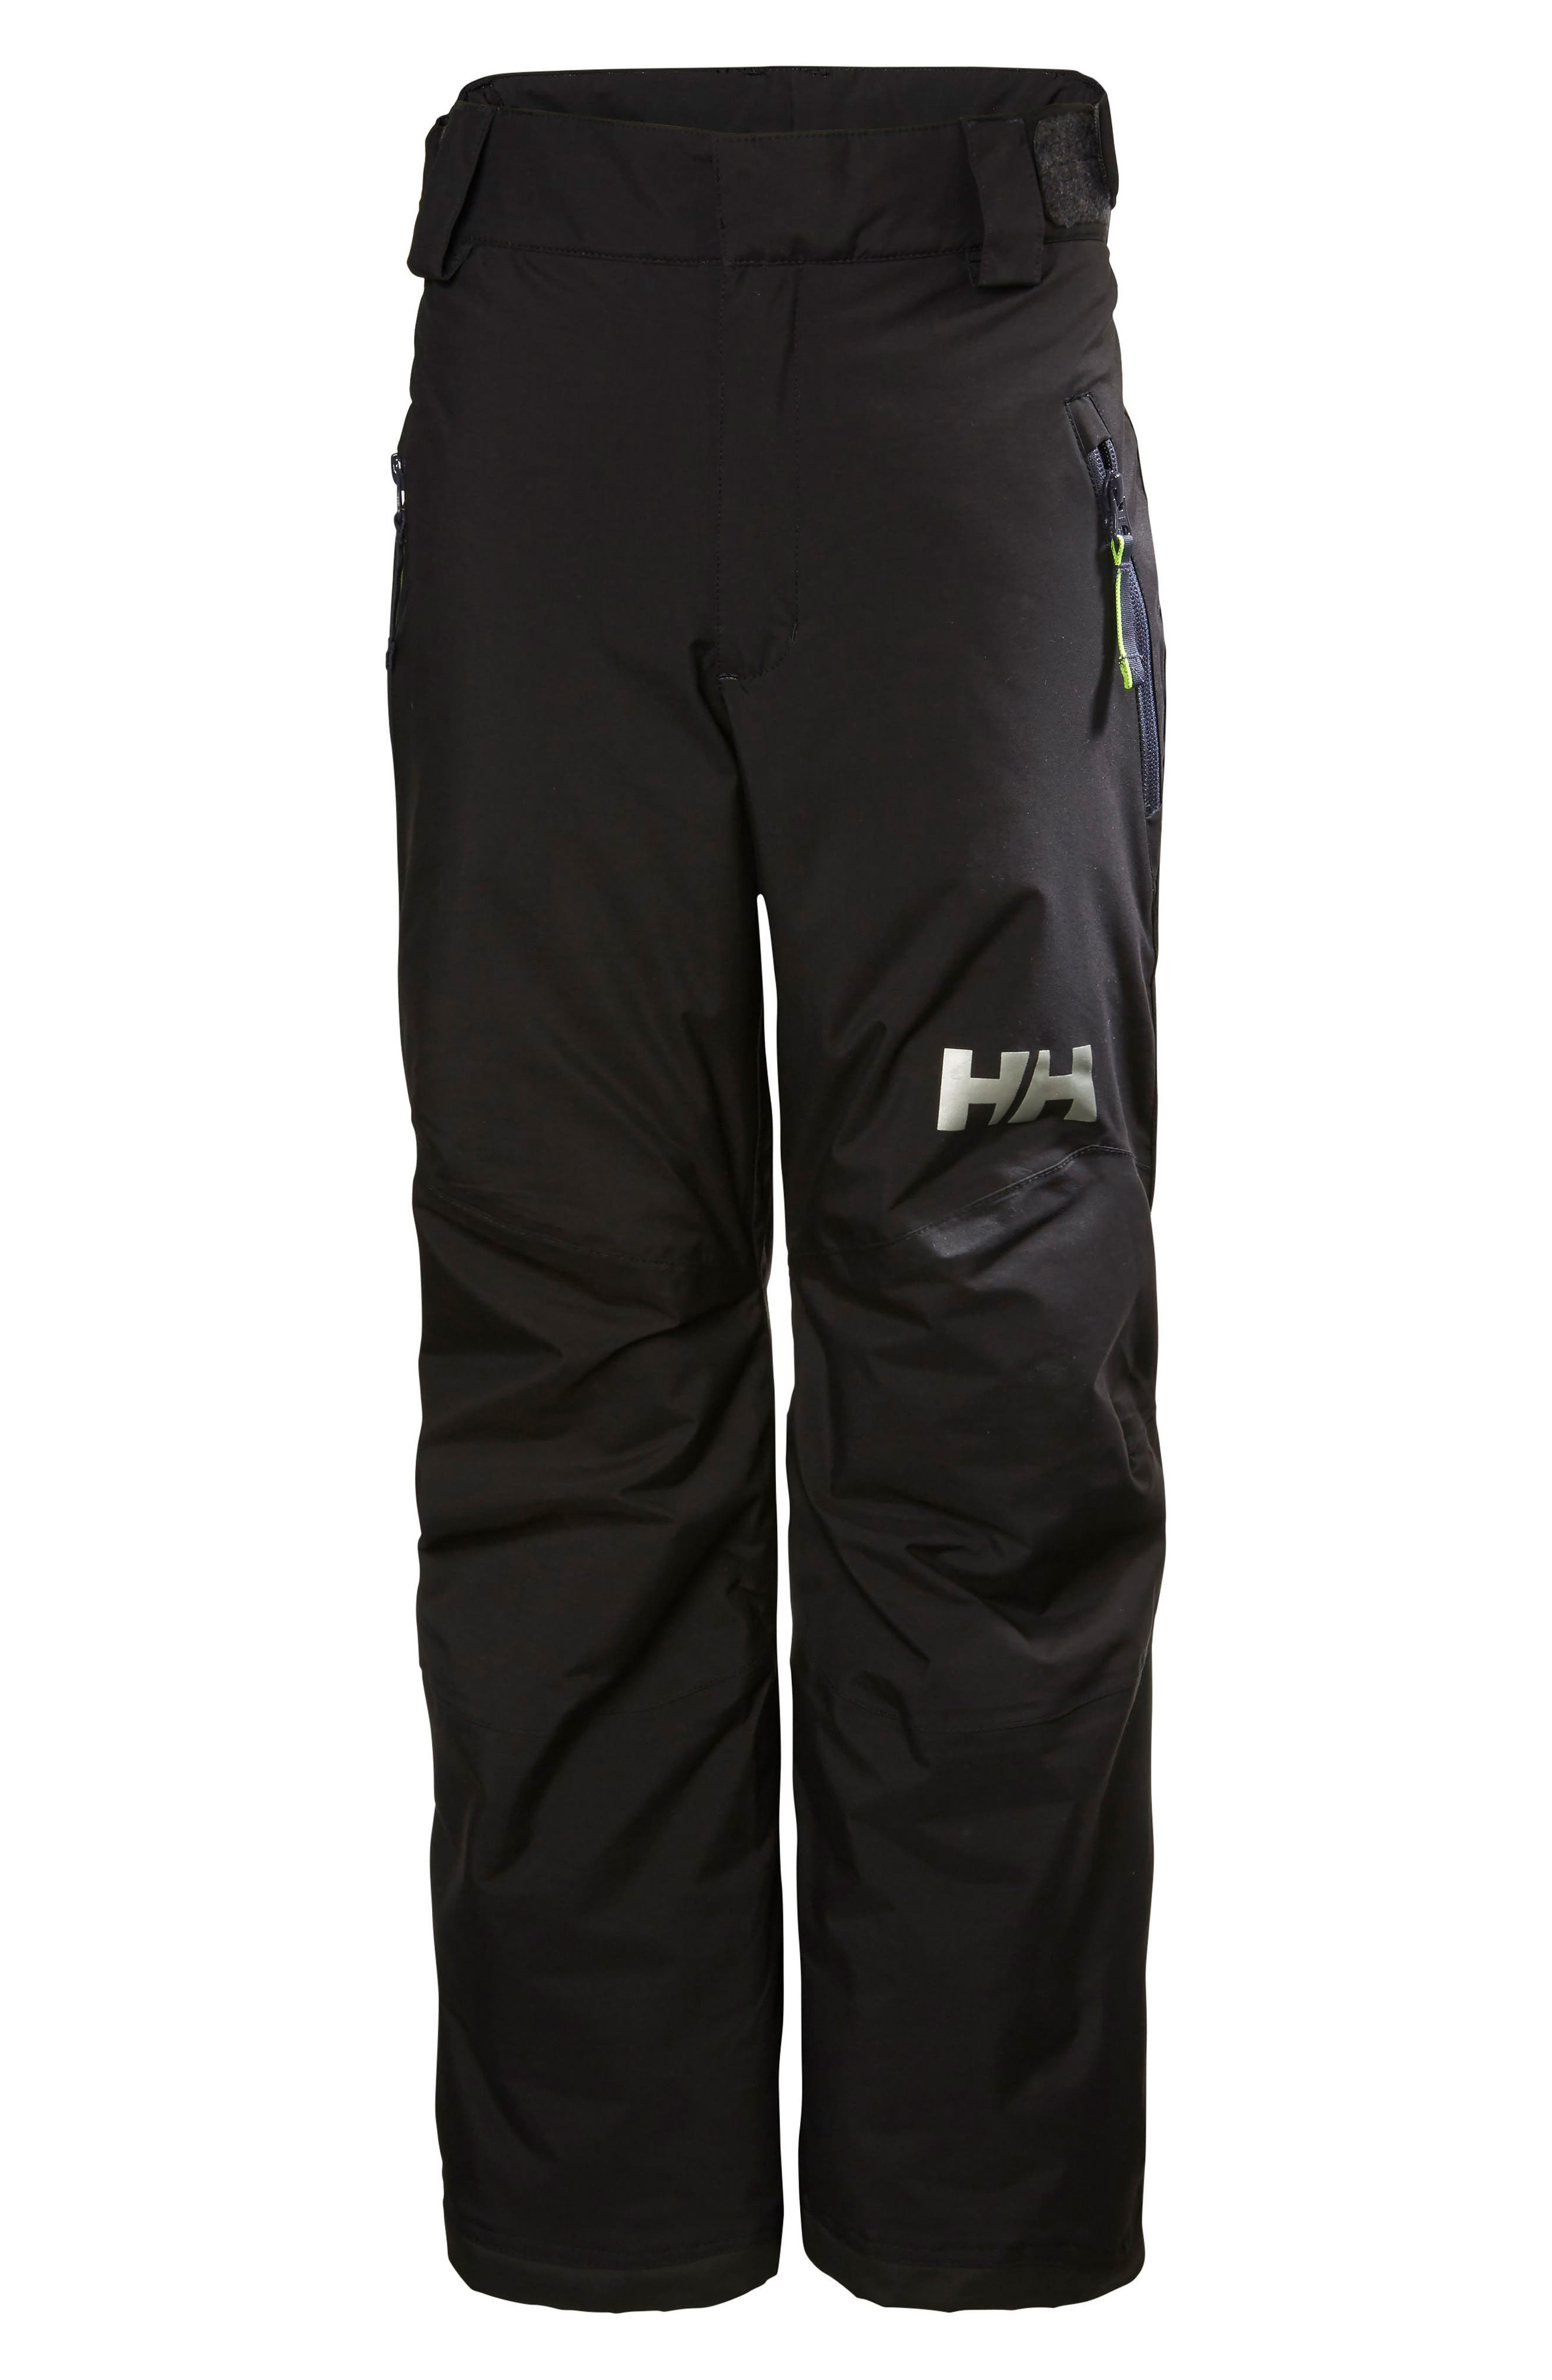 Main Image - Helly Hansen Legendary Waterproof PrimaLoft® Insulated Snow Pants (Big Boys)